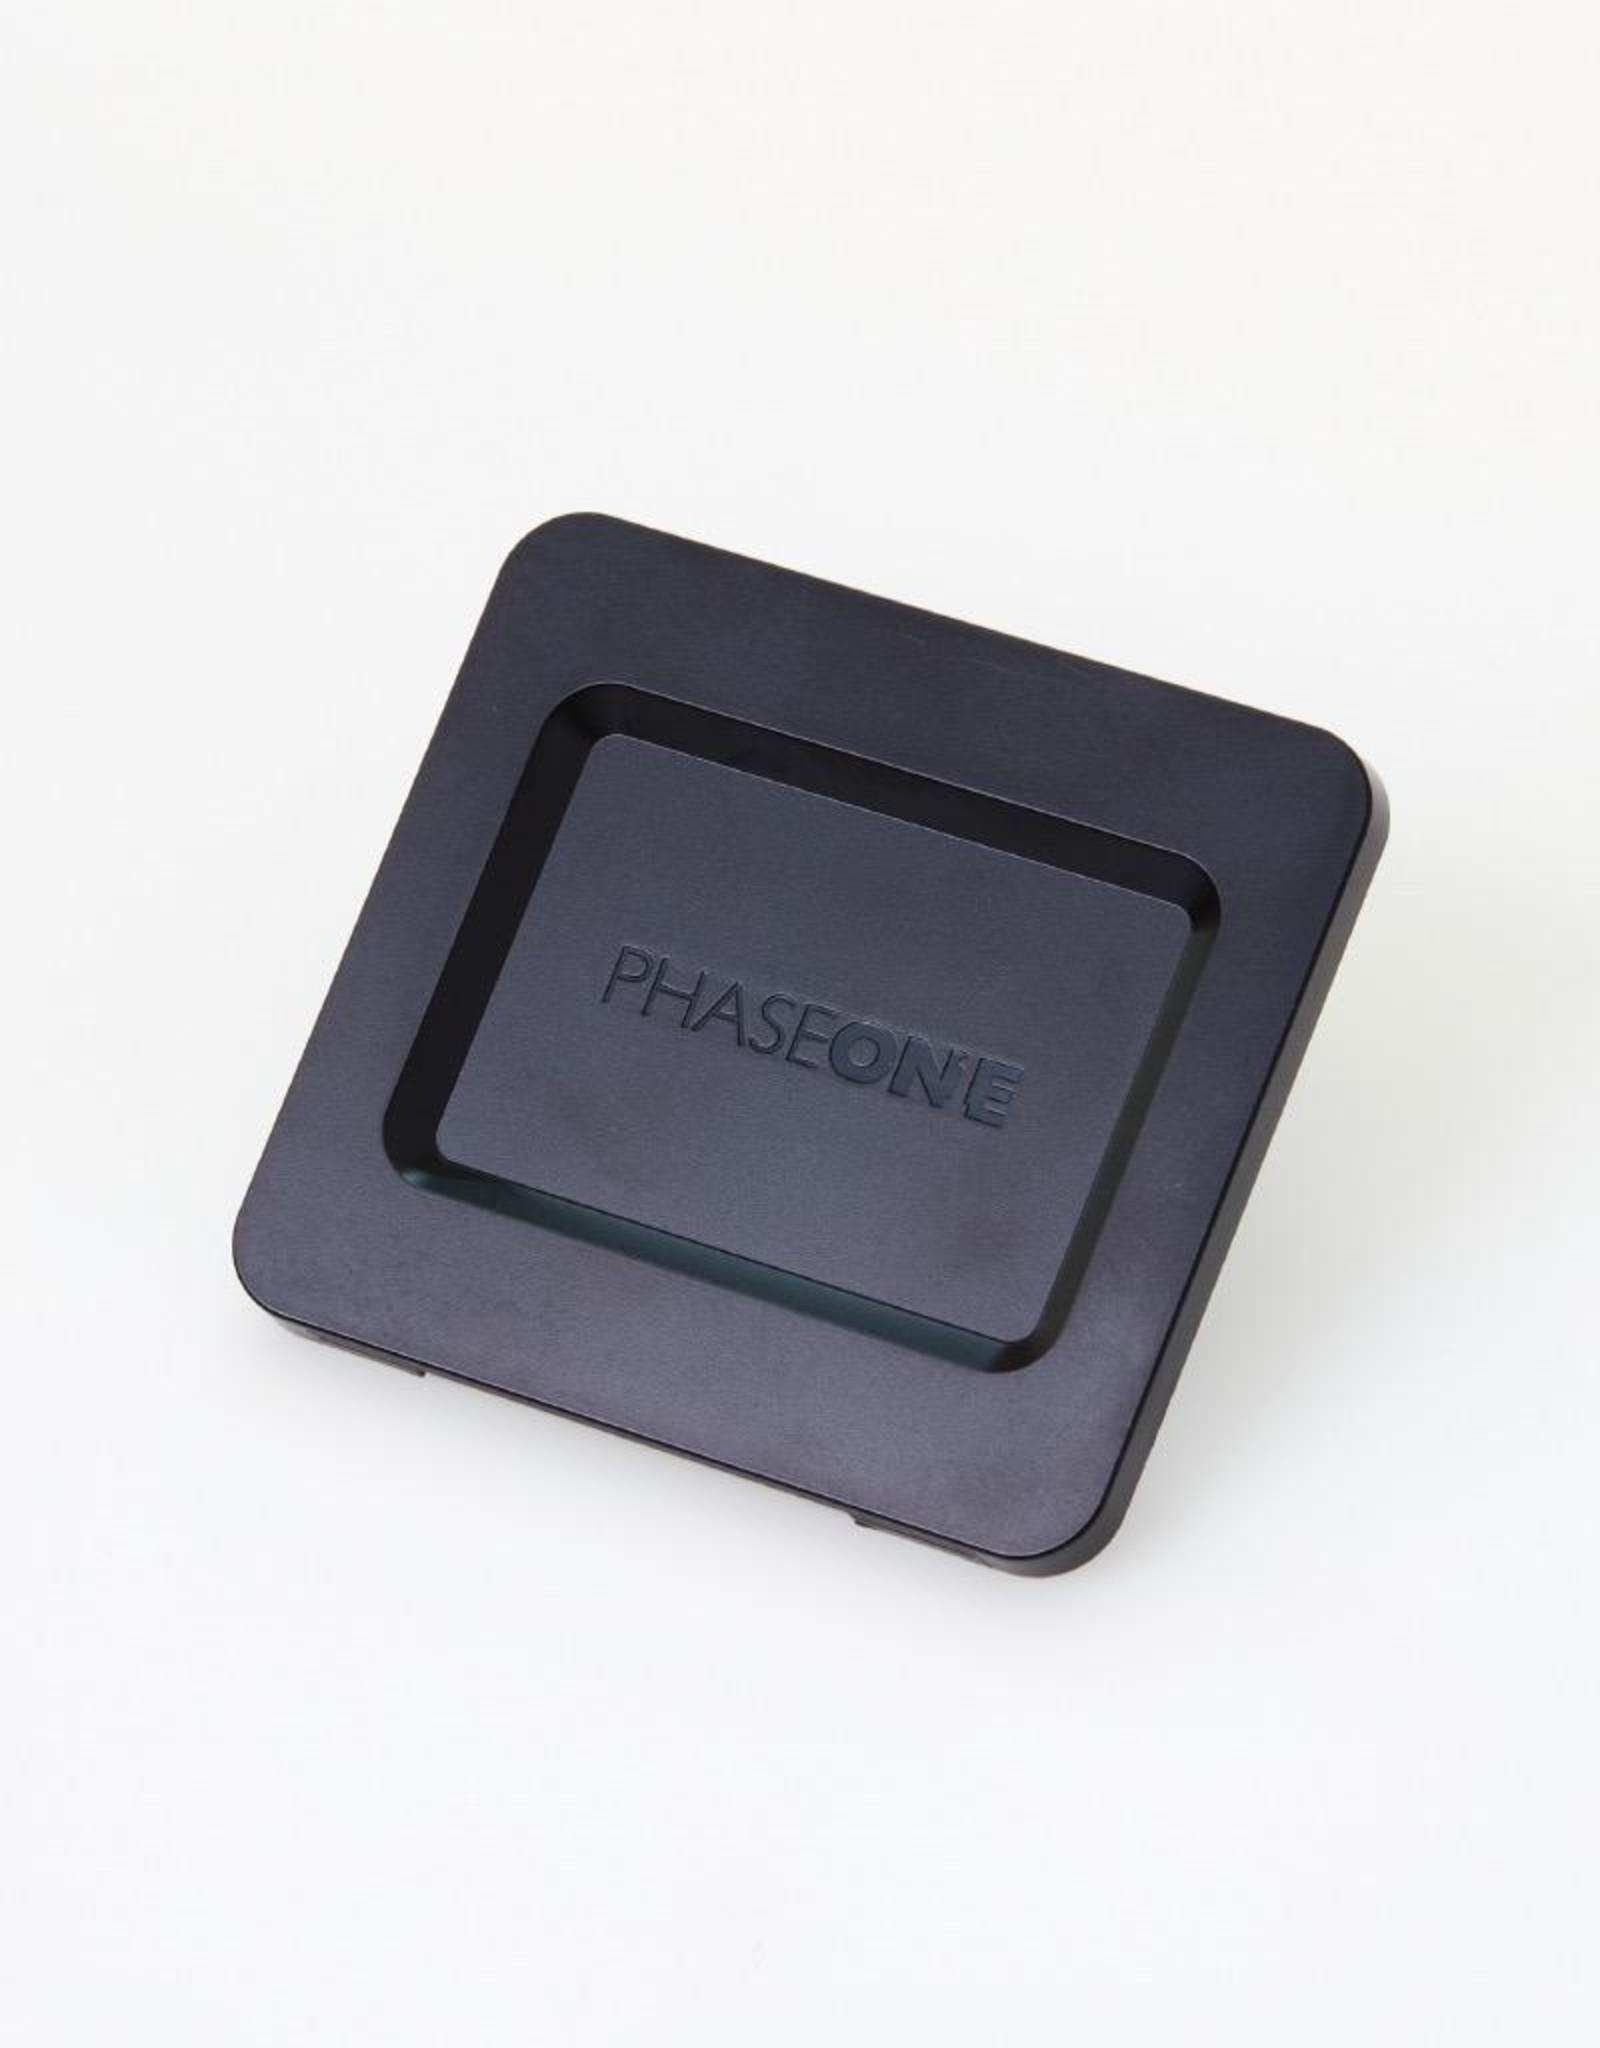 Phase One Phase One XF Camera body digital back port cover